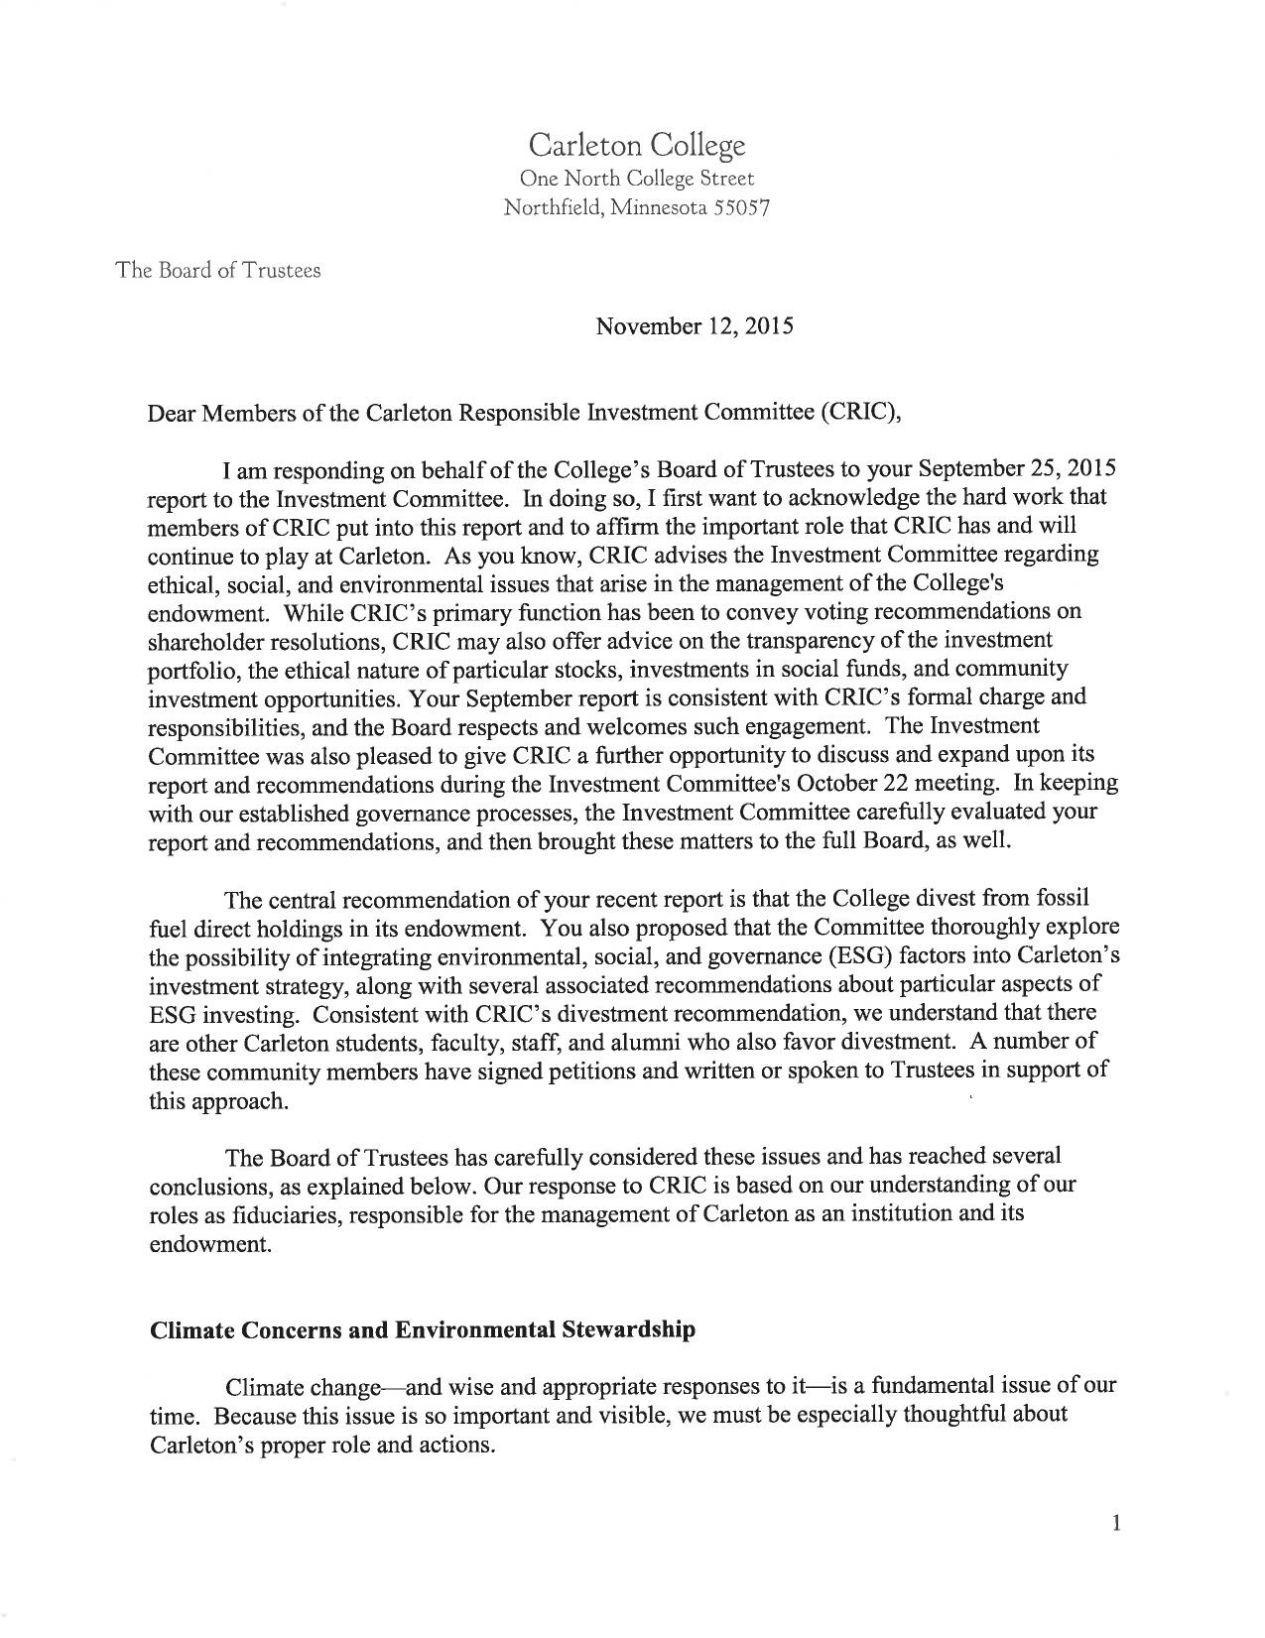 Board of Trustees response